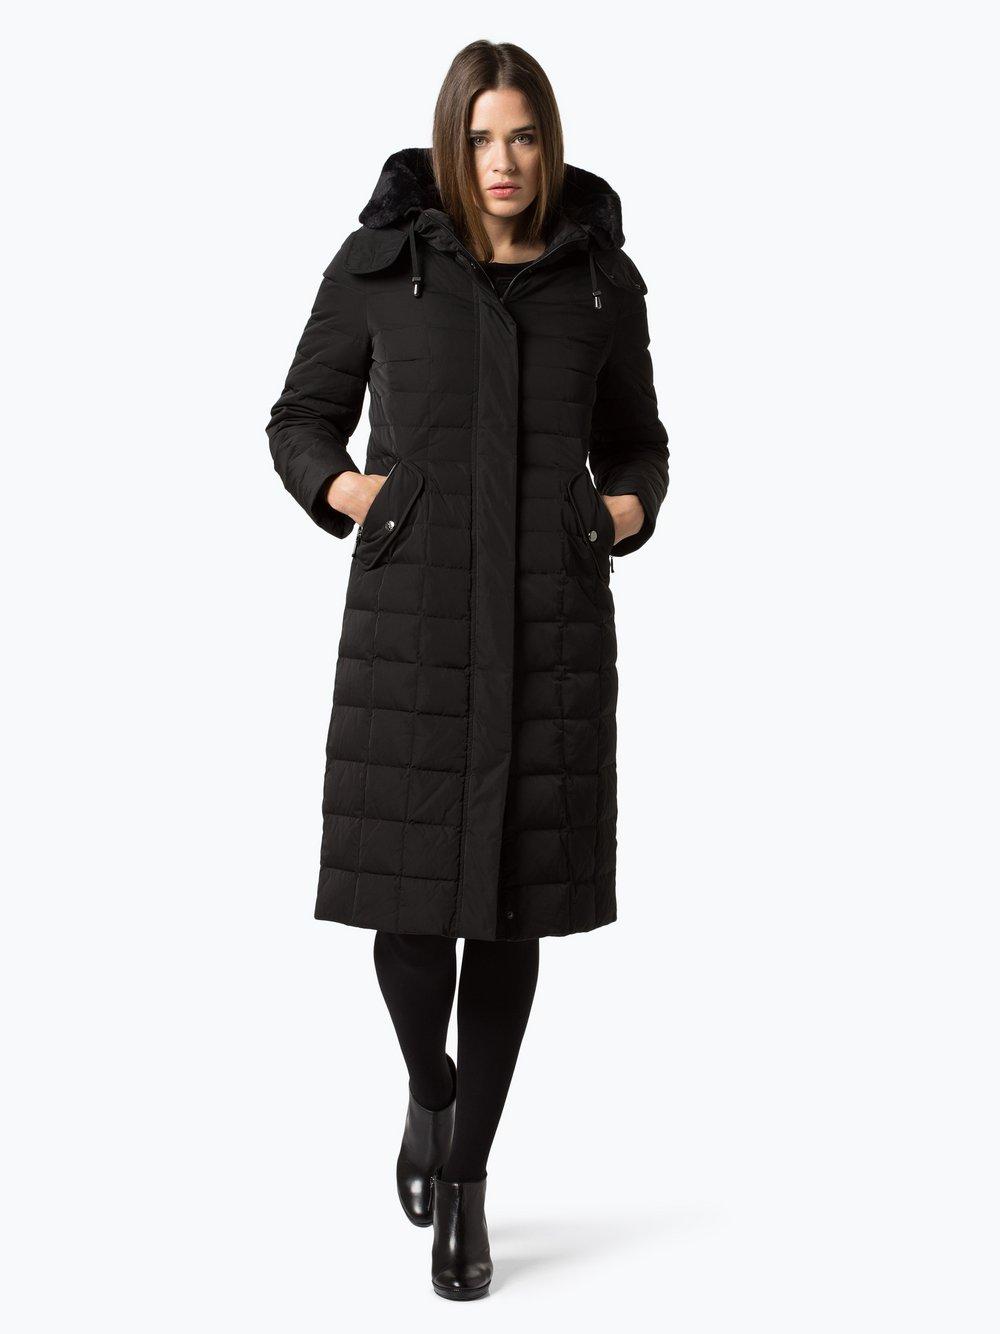 low cost new design cheap prices Gil Bret Damen Daunenmantel online kaufen | VANGRAAF.COM